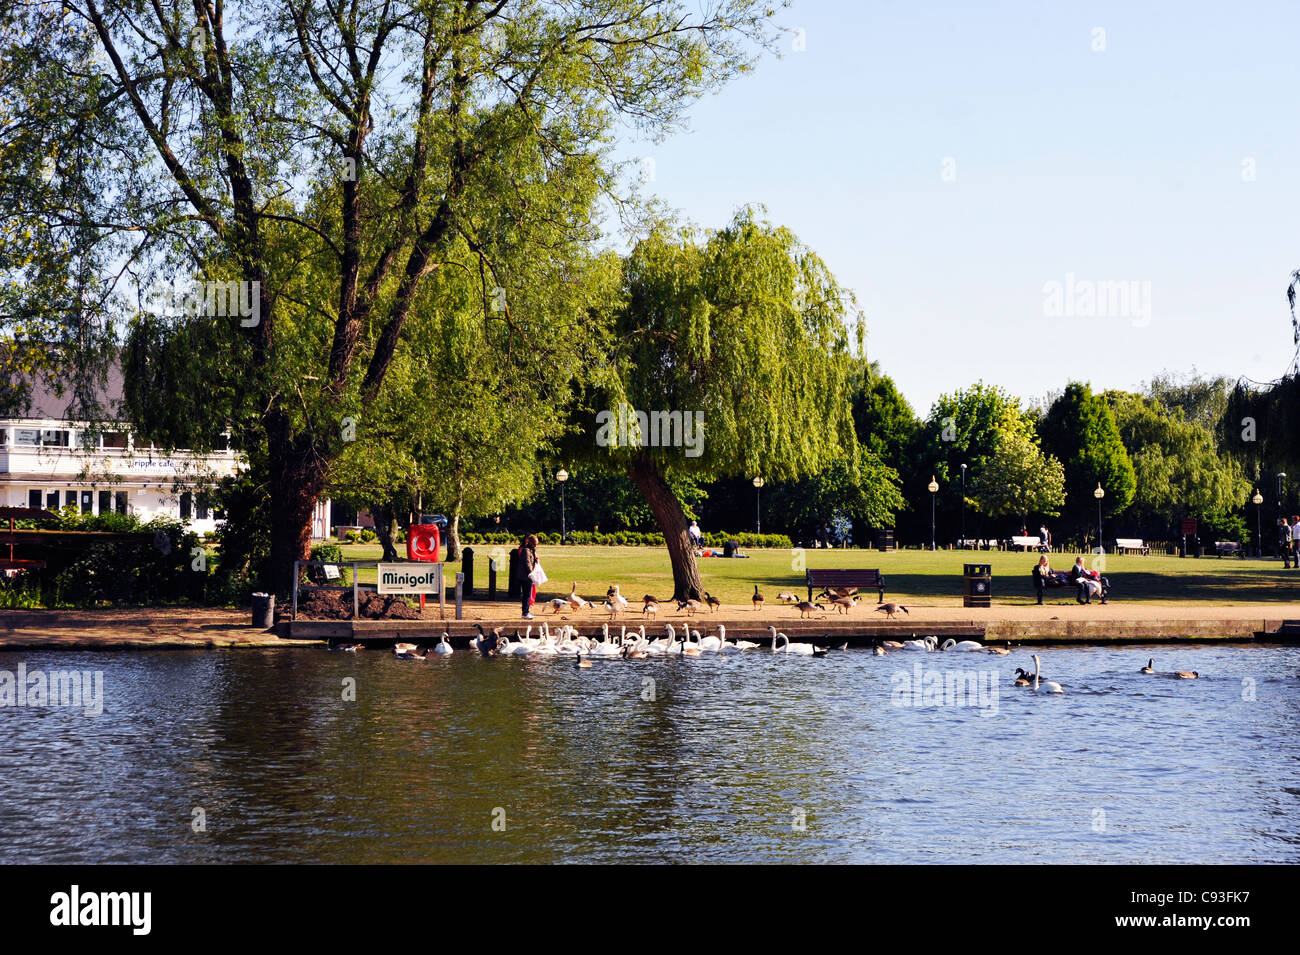 Stratford upon Avon. - Stock Image